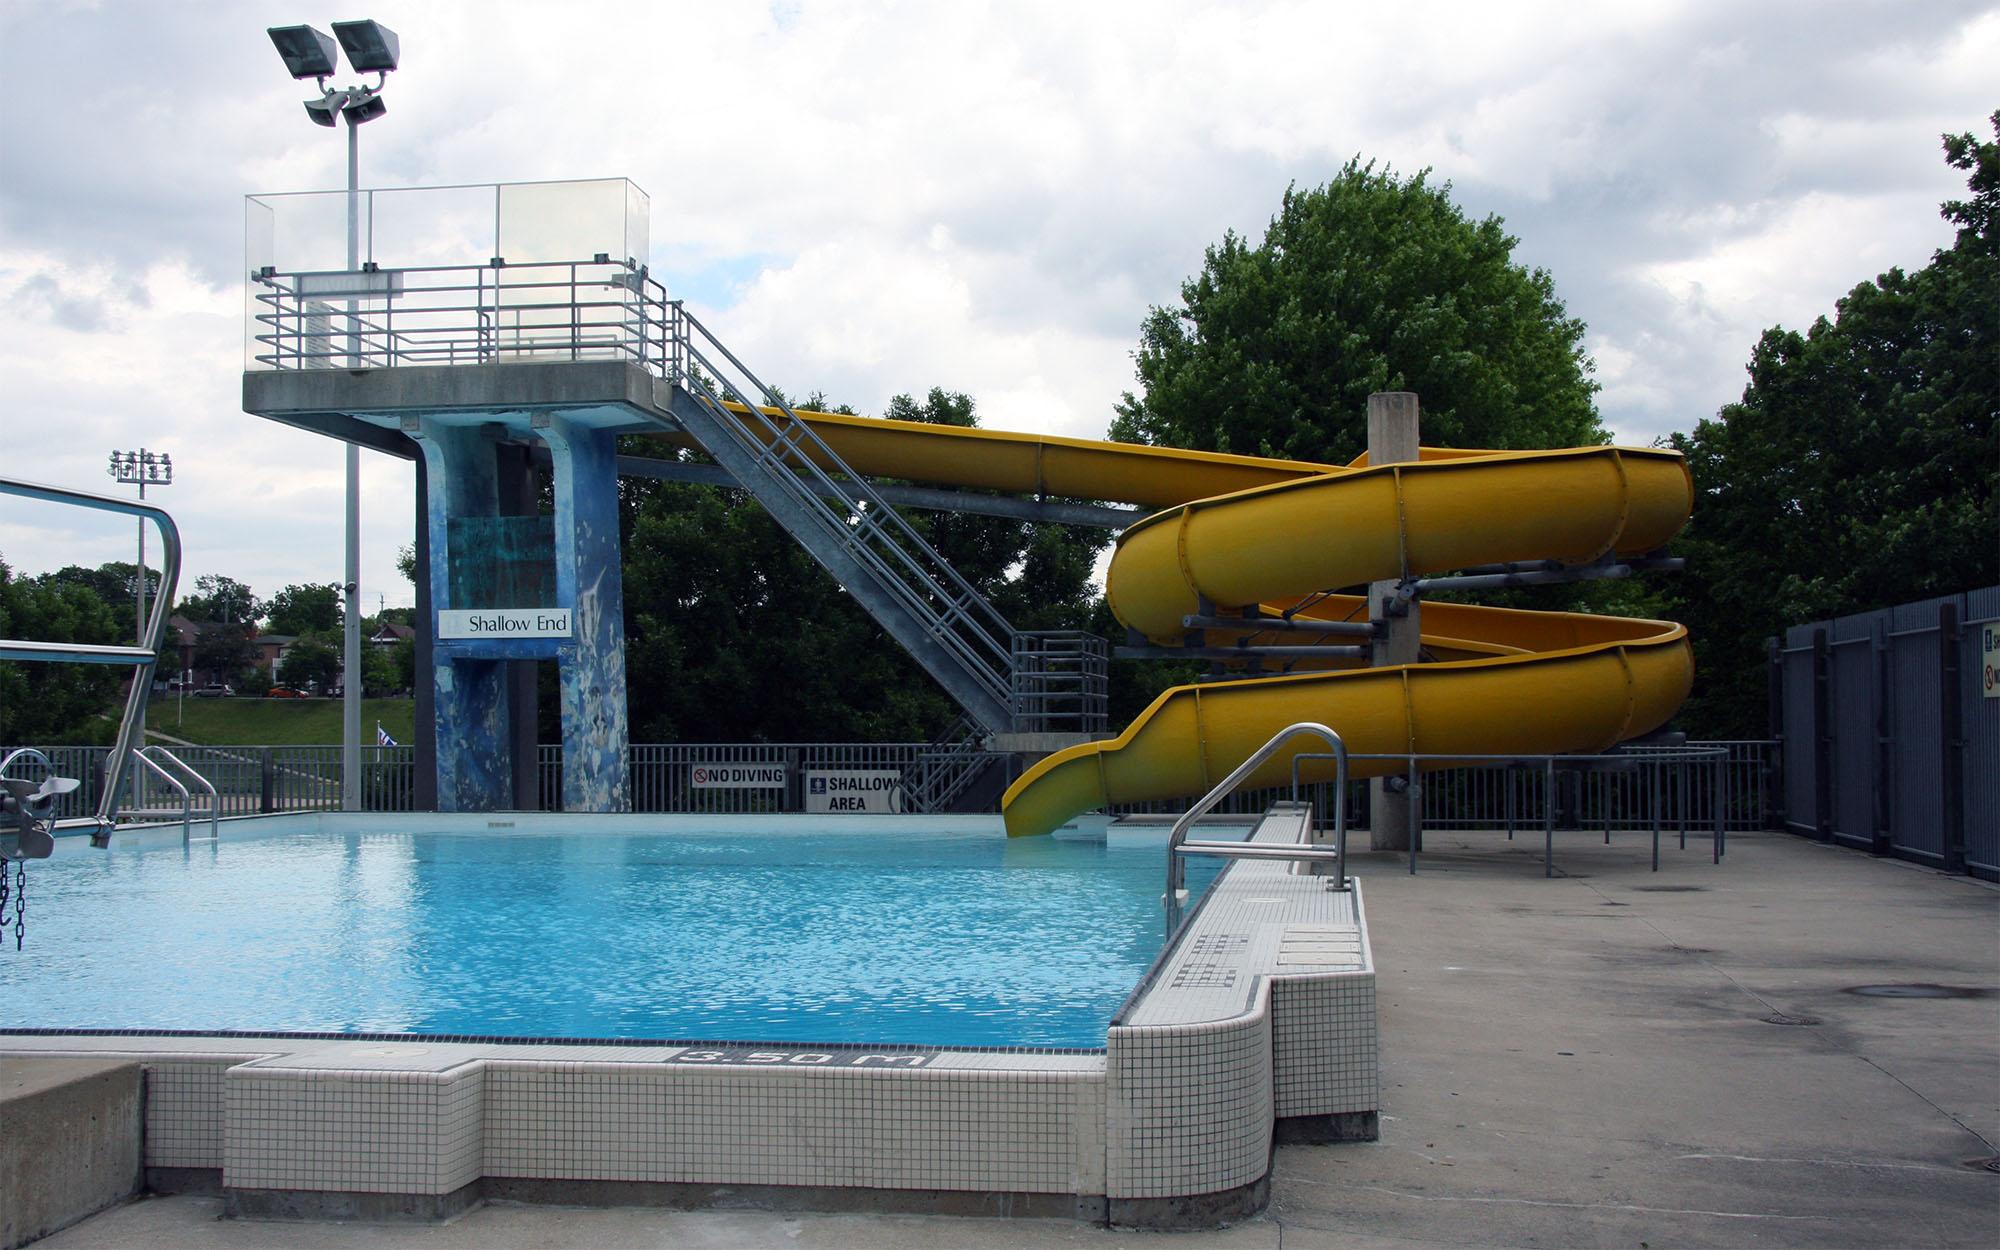 Alex Duff Memorial Pool - City of Toronto